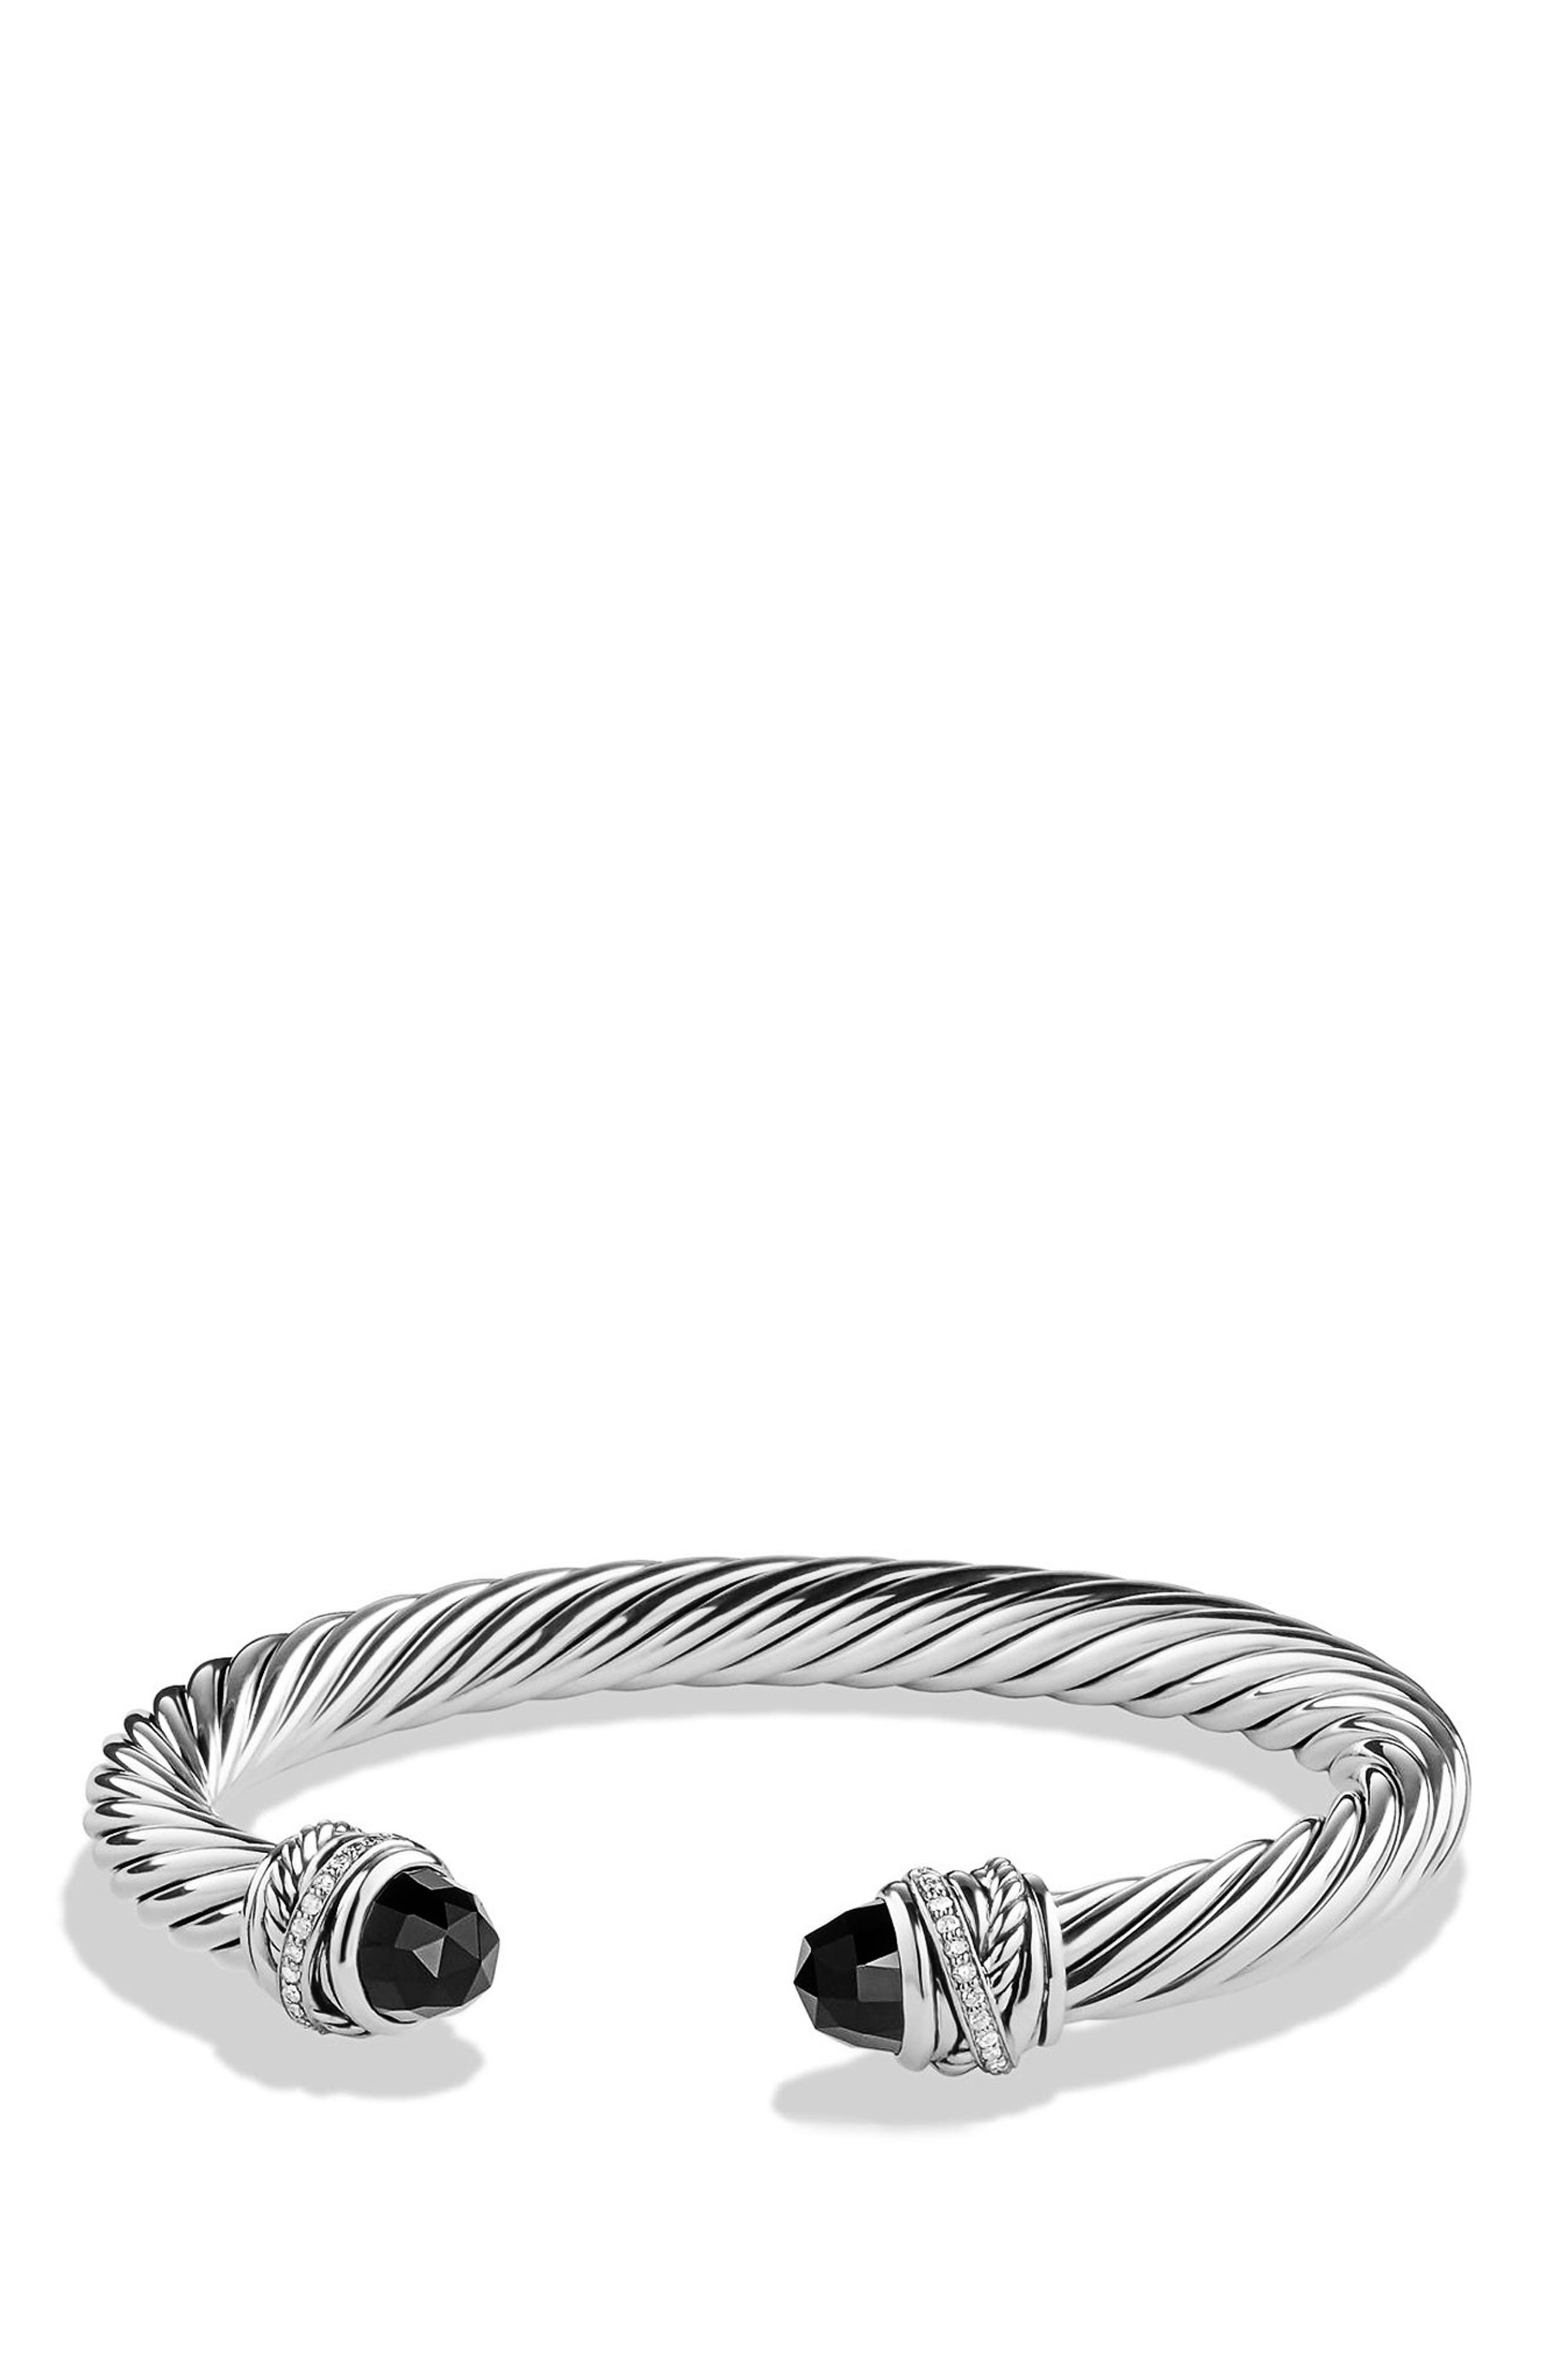 DAVID YURMAN, Crossover Bracelet with Diamonds, 7mm, Main thumbnail 1, color, BLACK ONYX